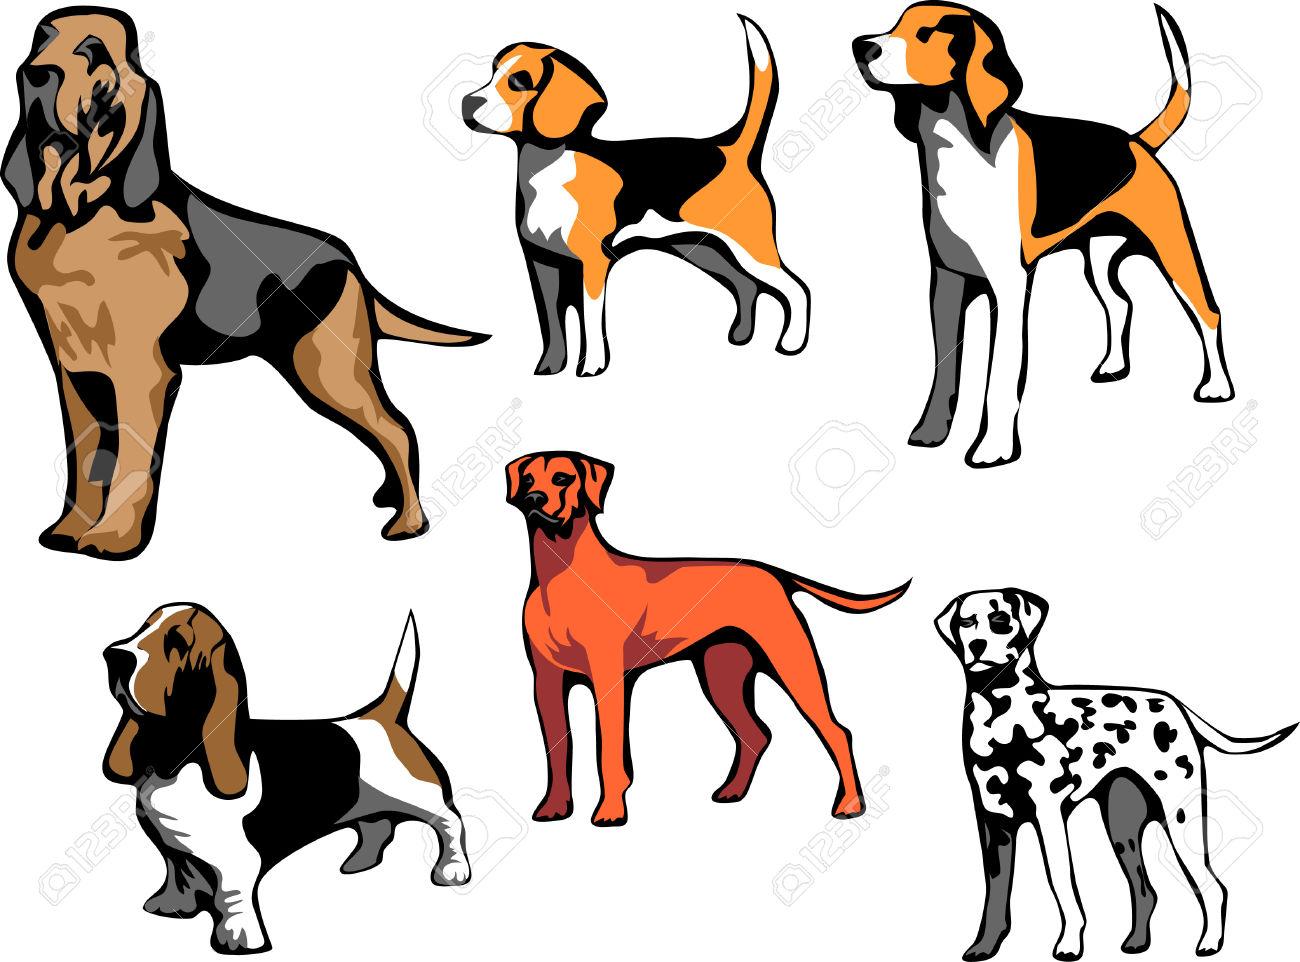 Beagle clipart bloodhound, Beagle bloodhound Transparent.